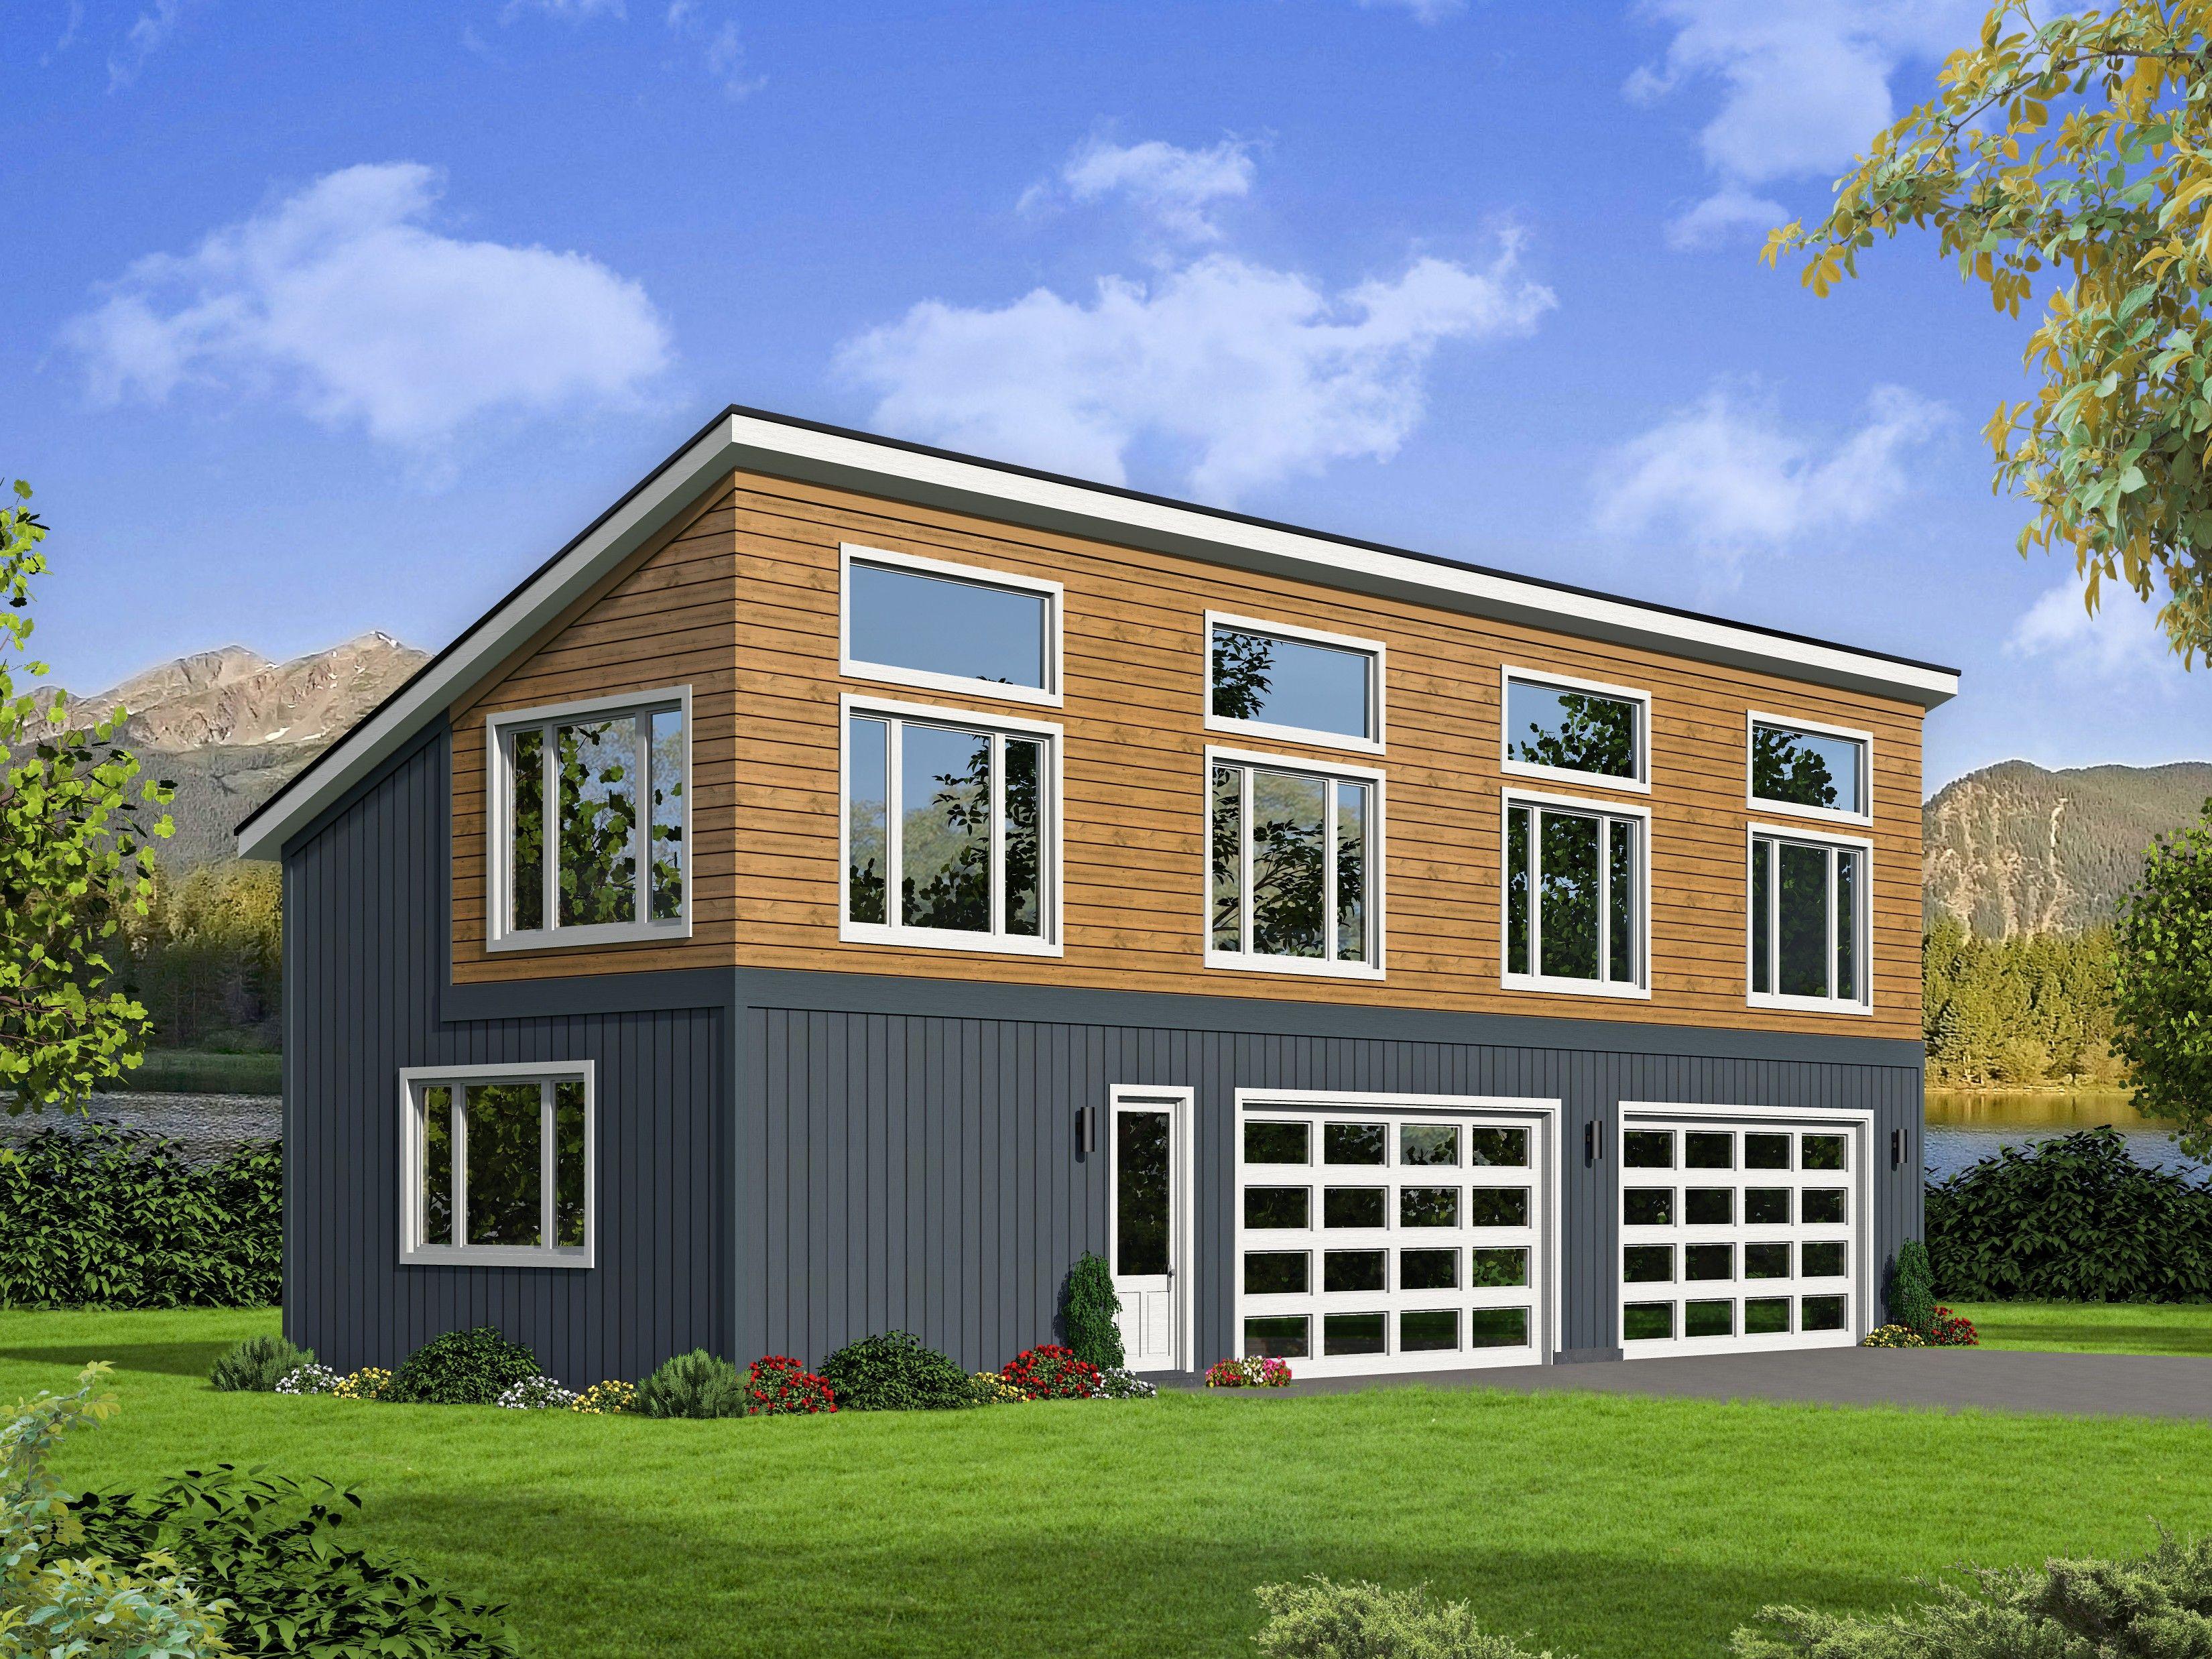 Hpp 27803 1 200 Heated And Cooled Square Feet Garage Garageplan 4cargarage Modern Moderngarage Garage Plans With Loft Modern Garage Garage Apartment Plans